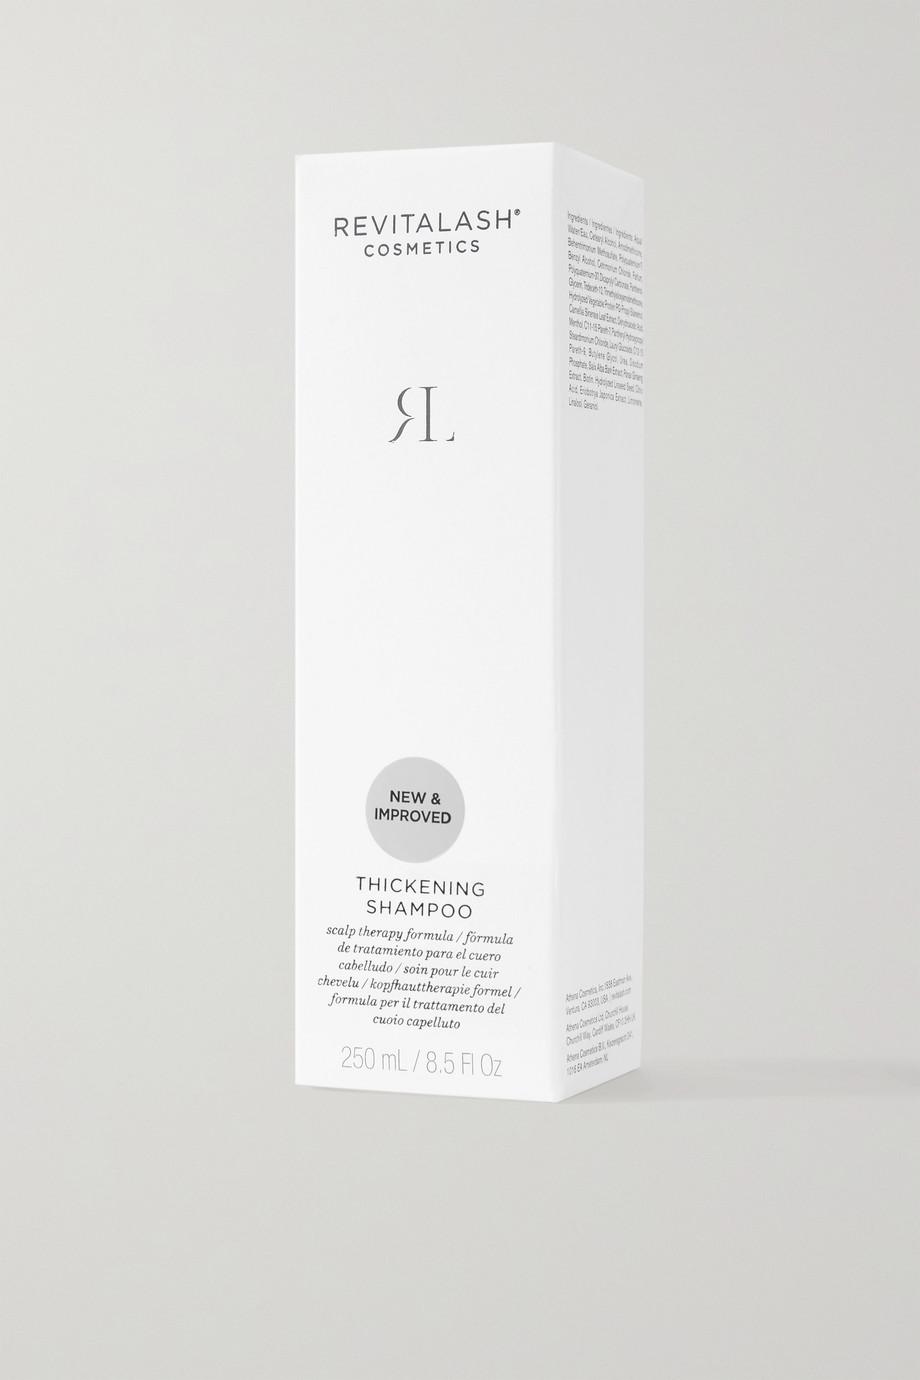 REVITALASH Thickening Shampoo, 250ml